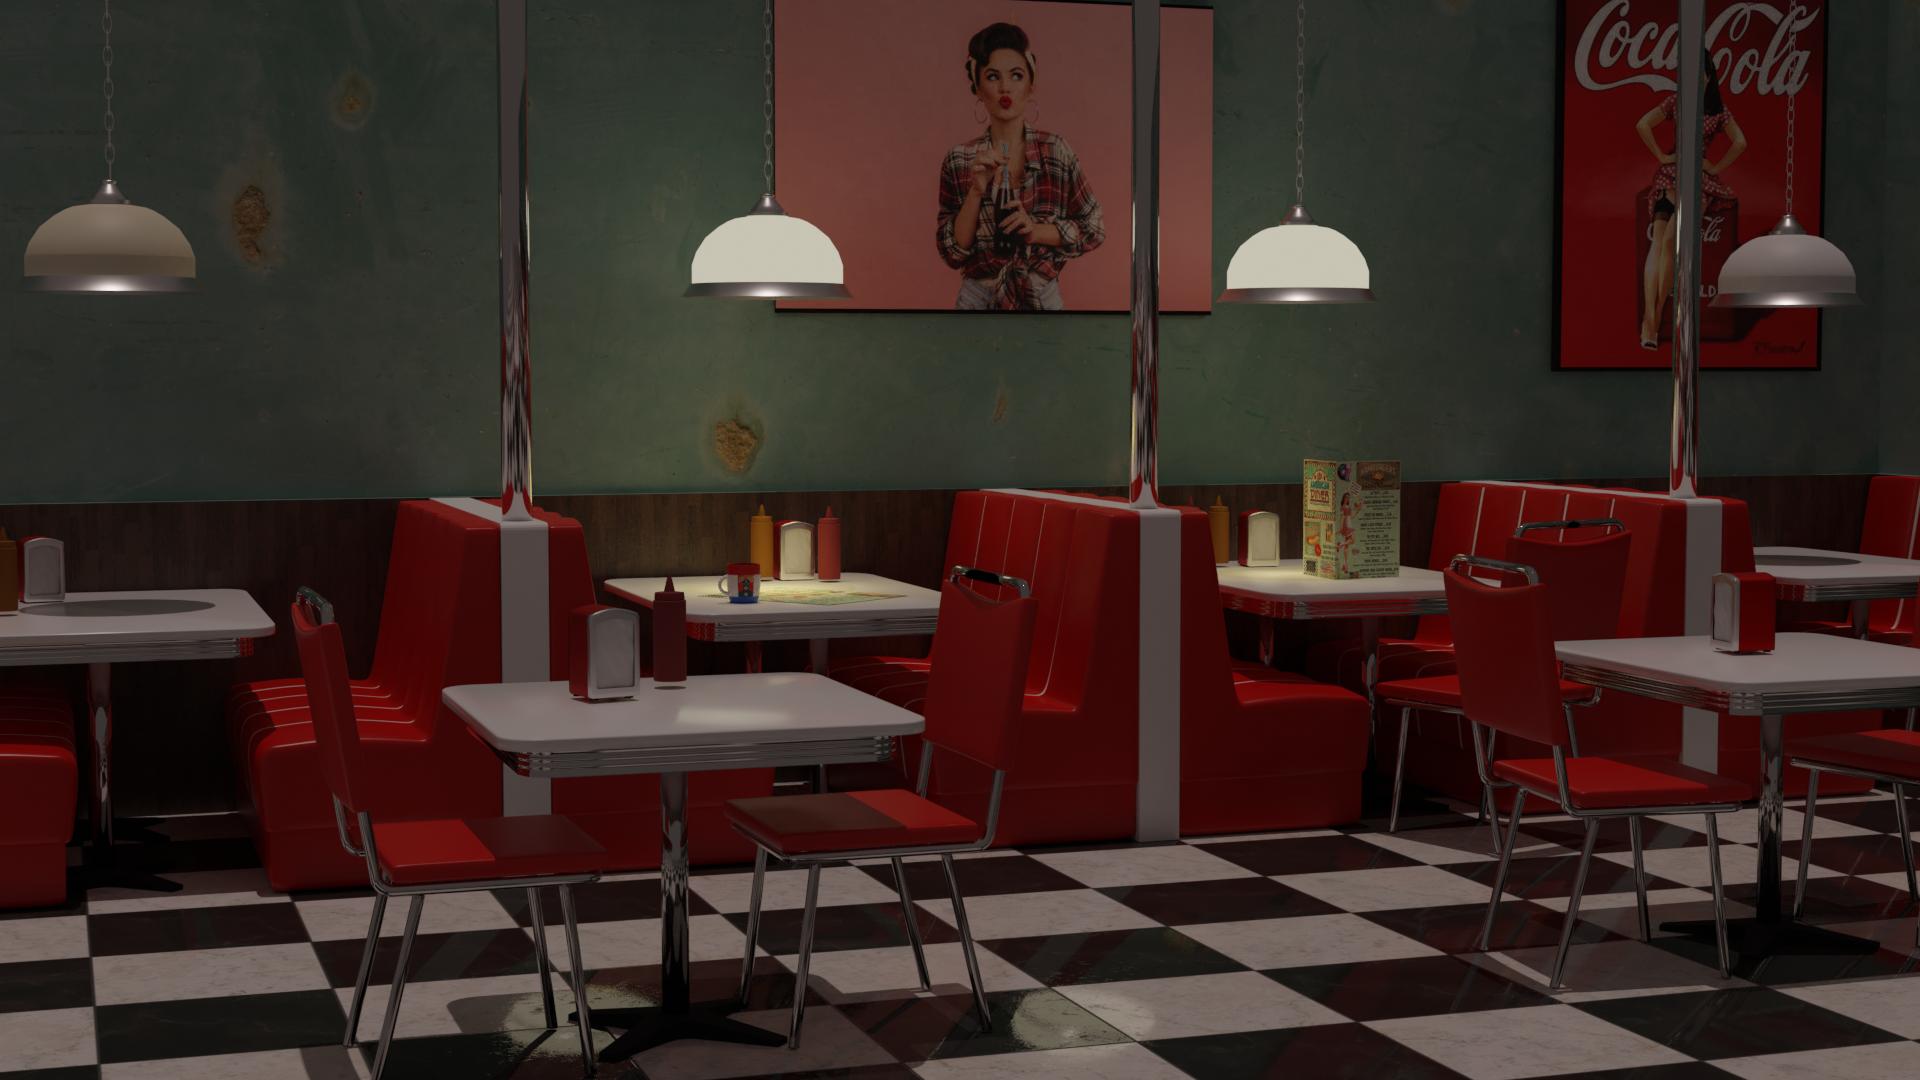 Blend Swap American Vintage Diner